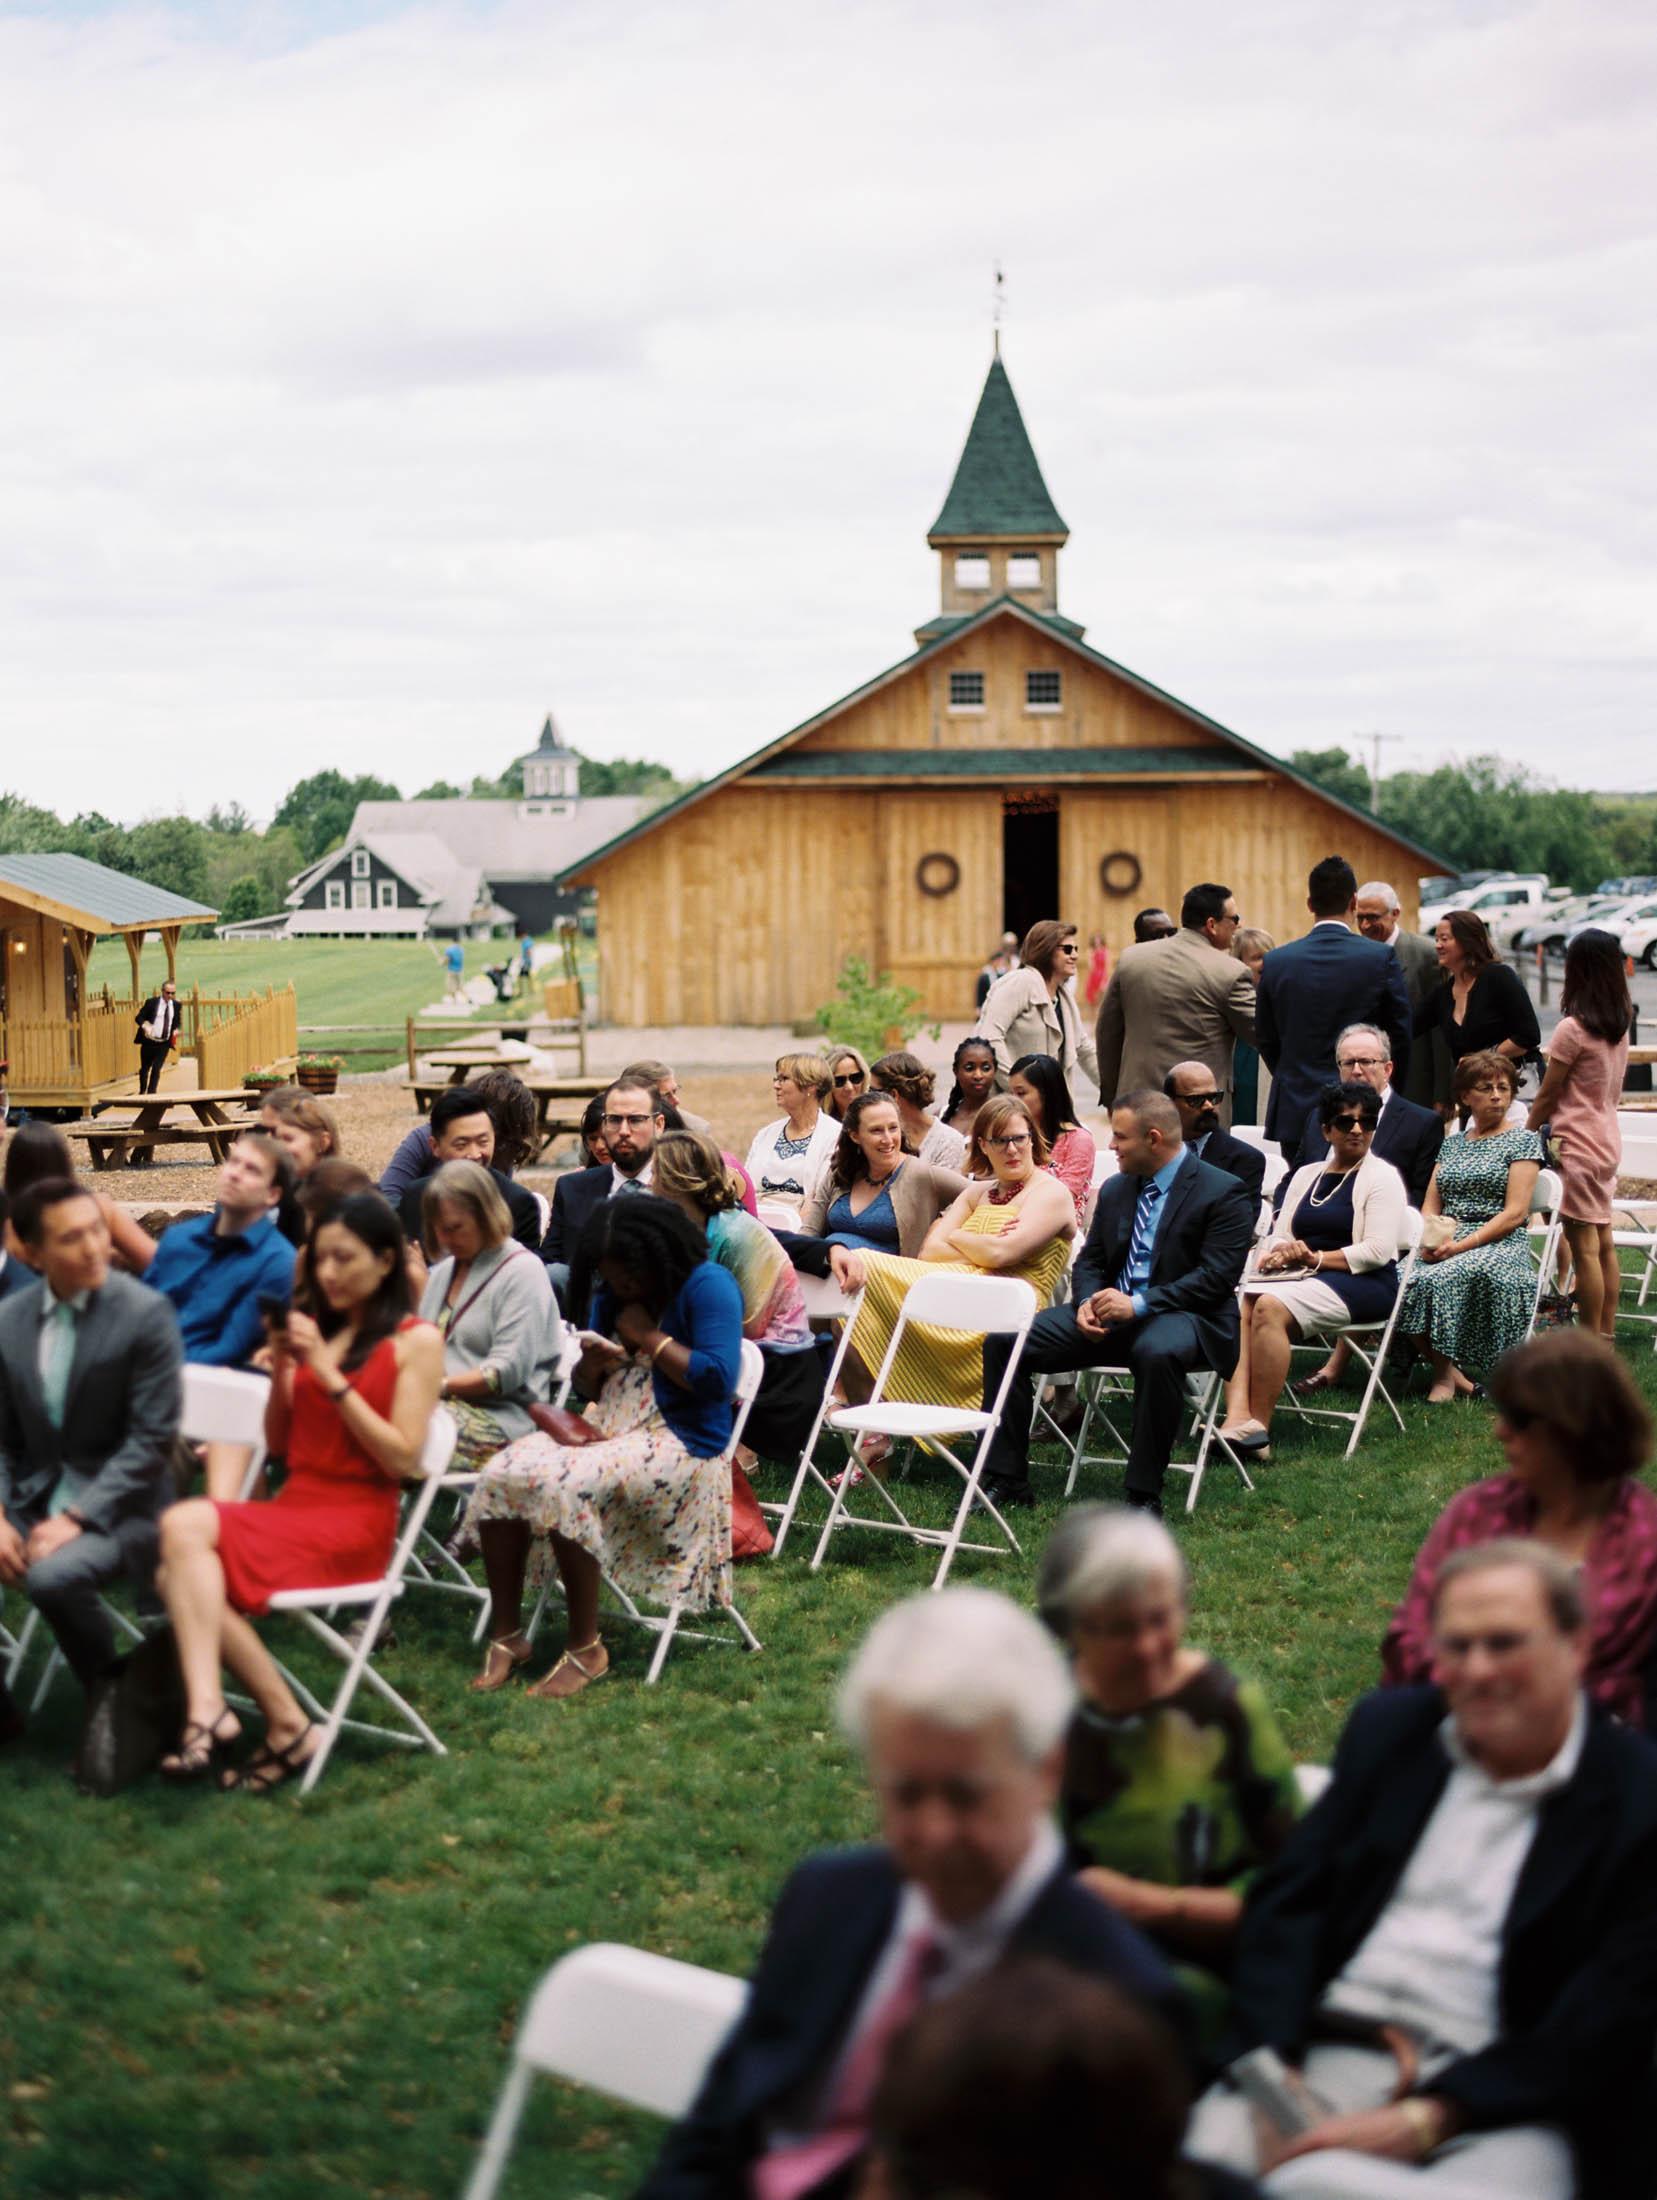 Blissful-Meadows-wedding-6.jpg